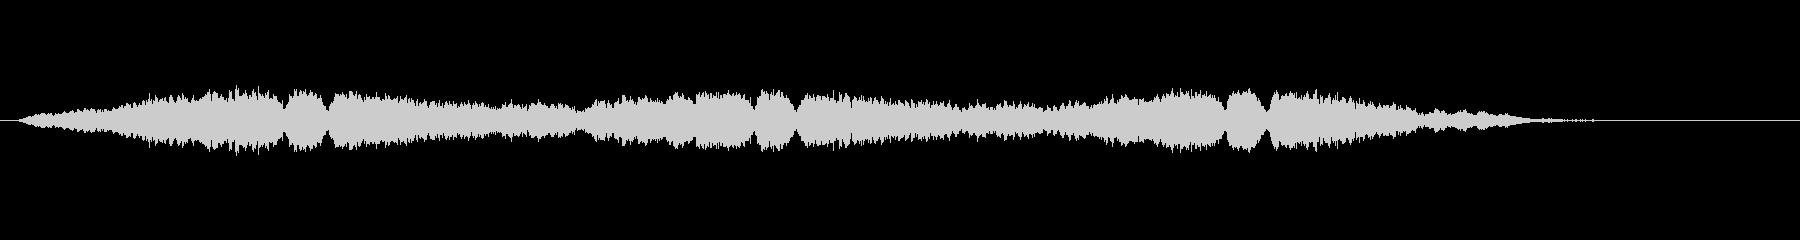 FI UFO ホバー02の未再生の波形